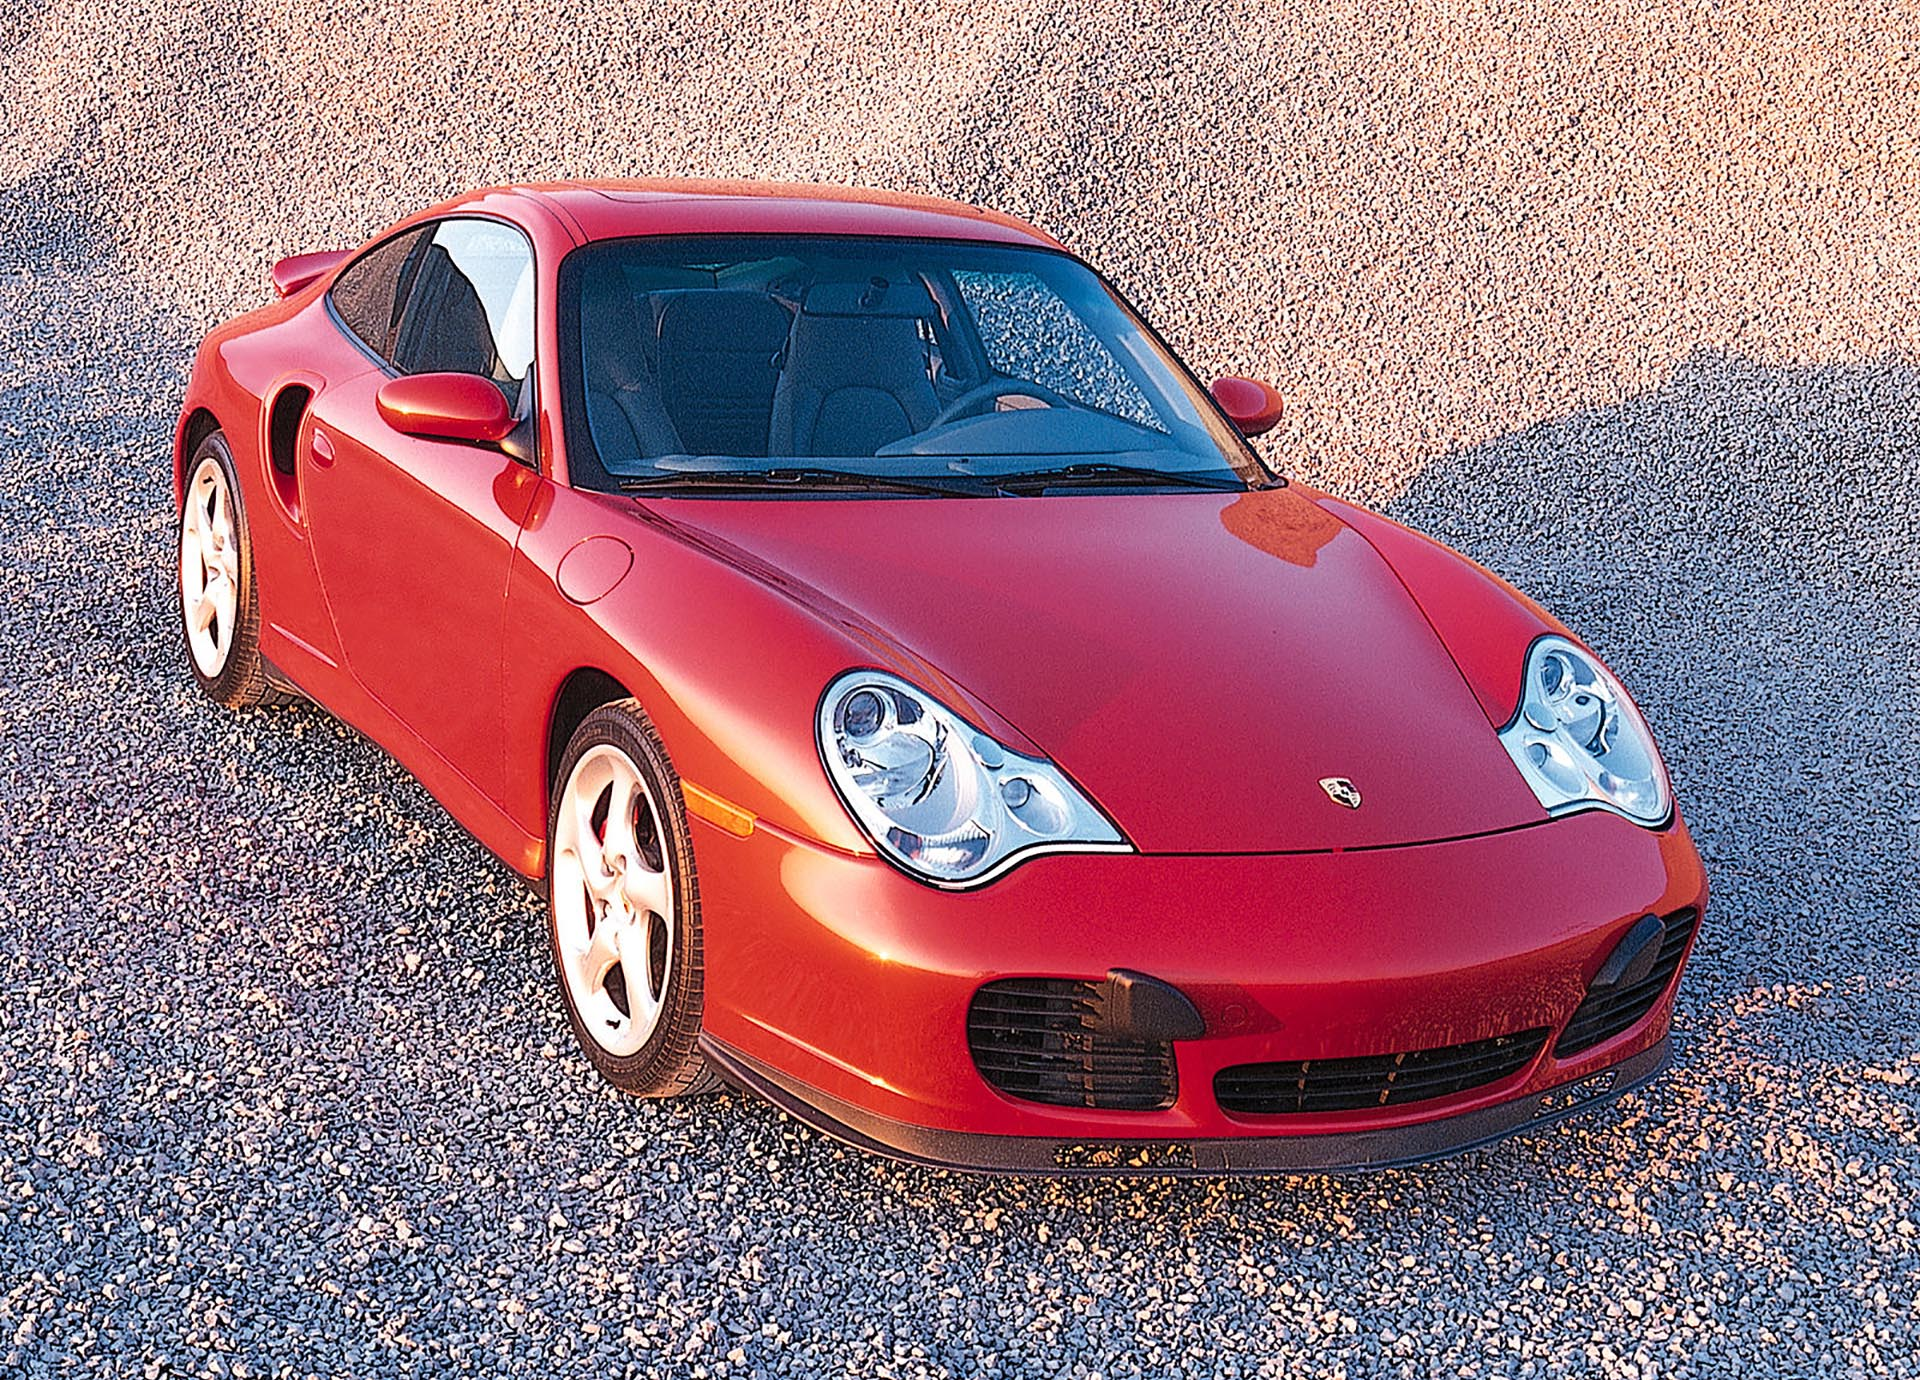 05_Porsche 996 911 Turbo front